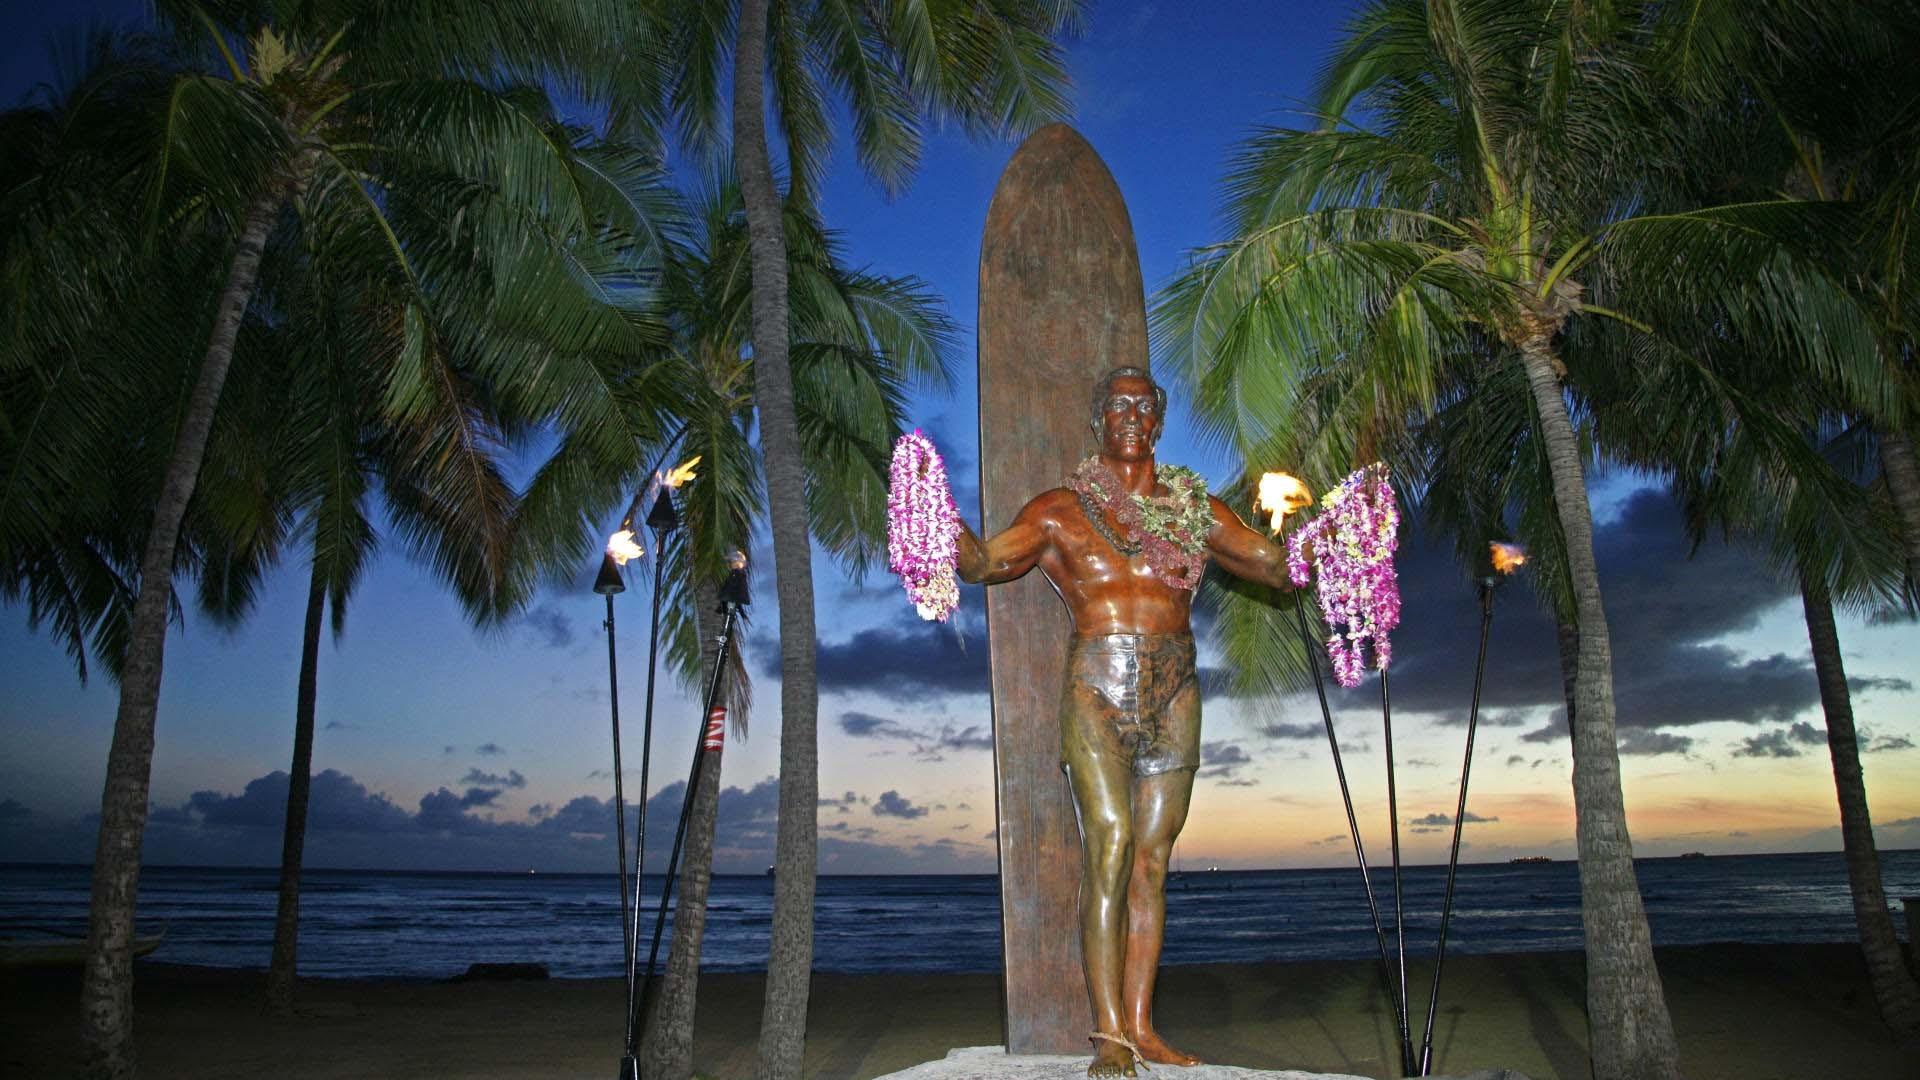 Waikiki Beach Oahu Hawaii | Hawaii HD Wallpapers Episode 1 | High  Definition Wallpapers